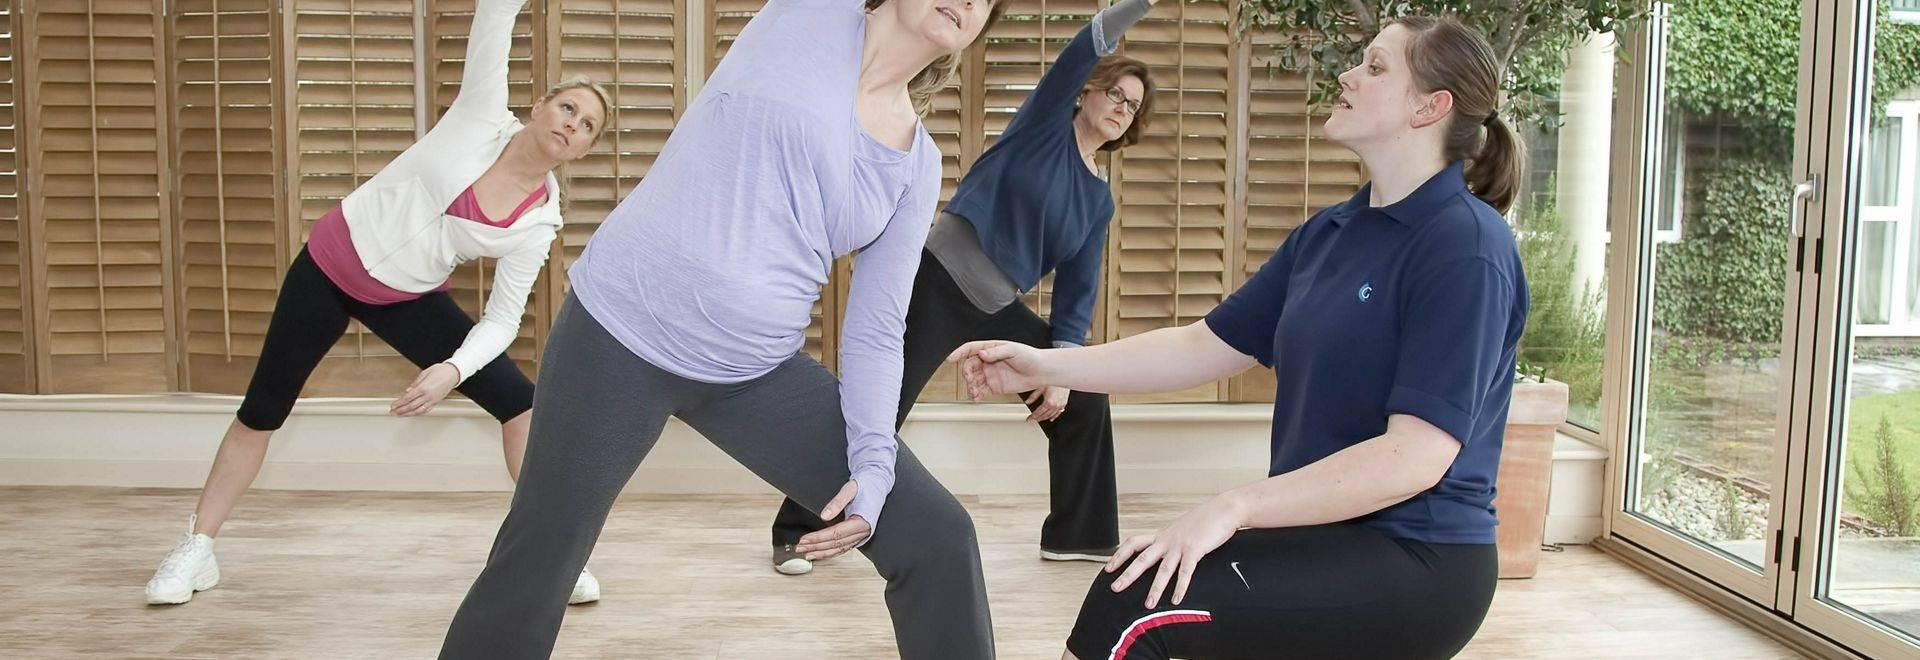 Grayshott-Spa-Yoga-2.jpg